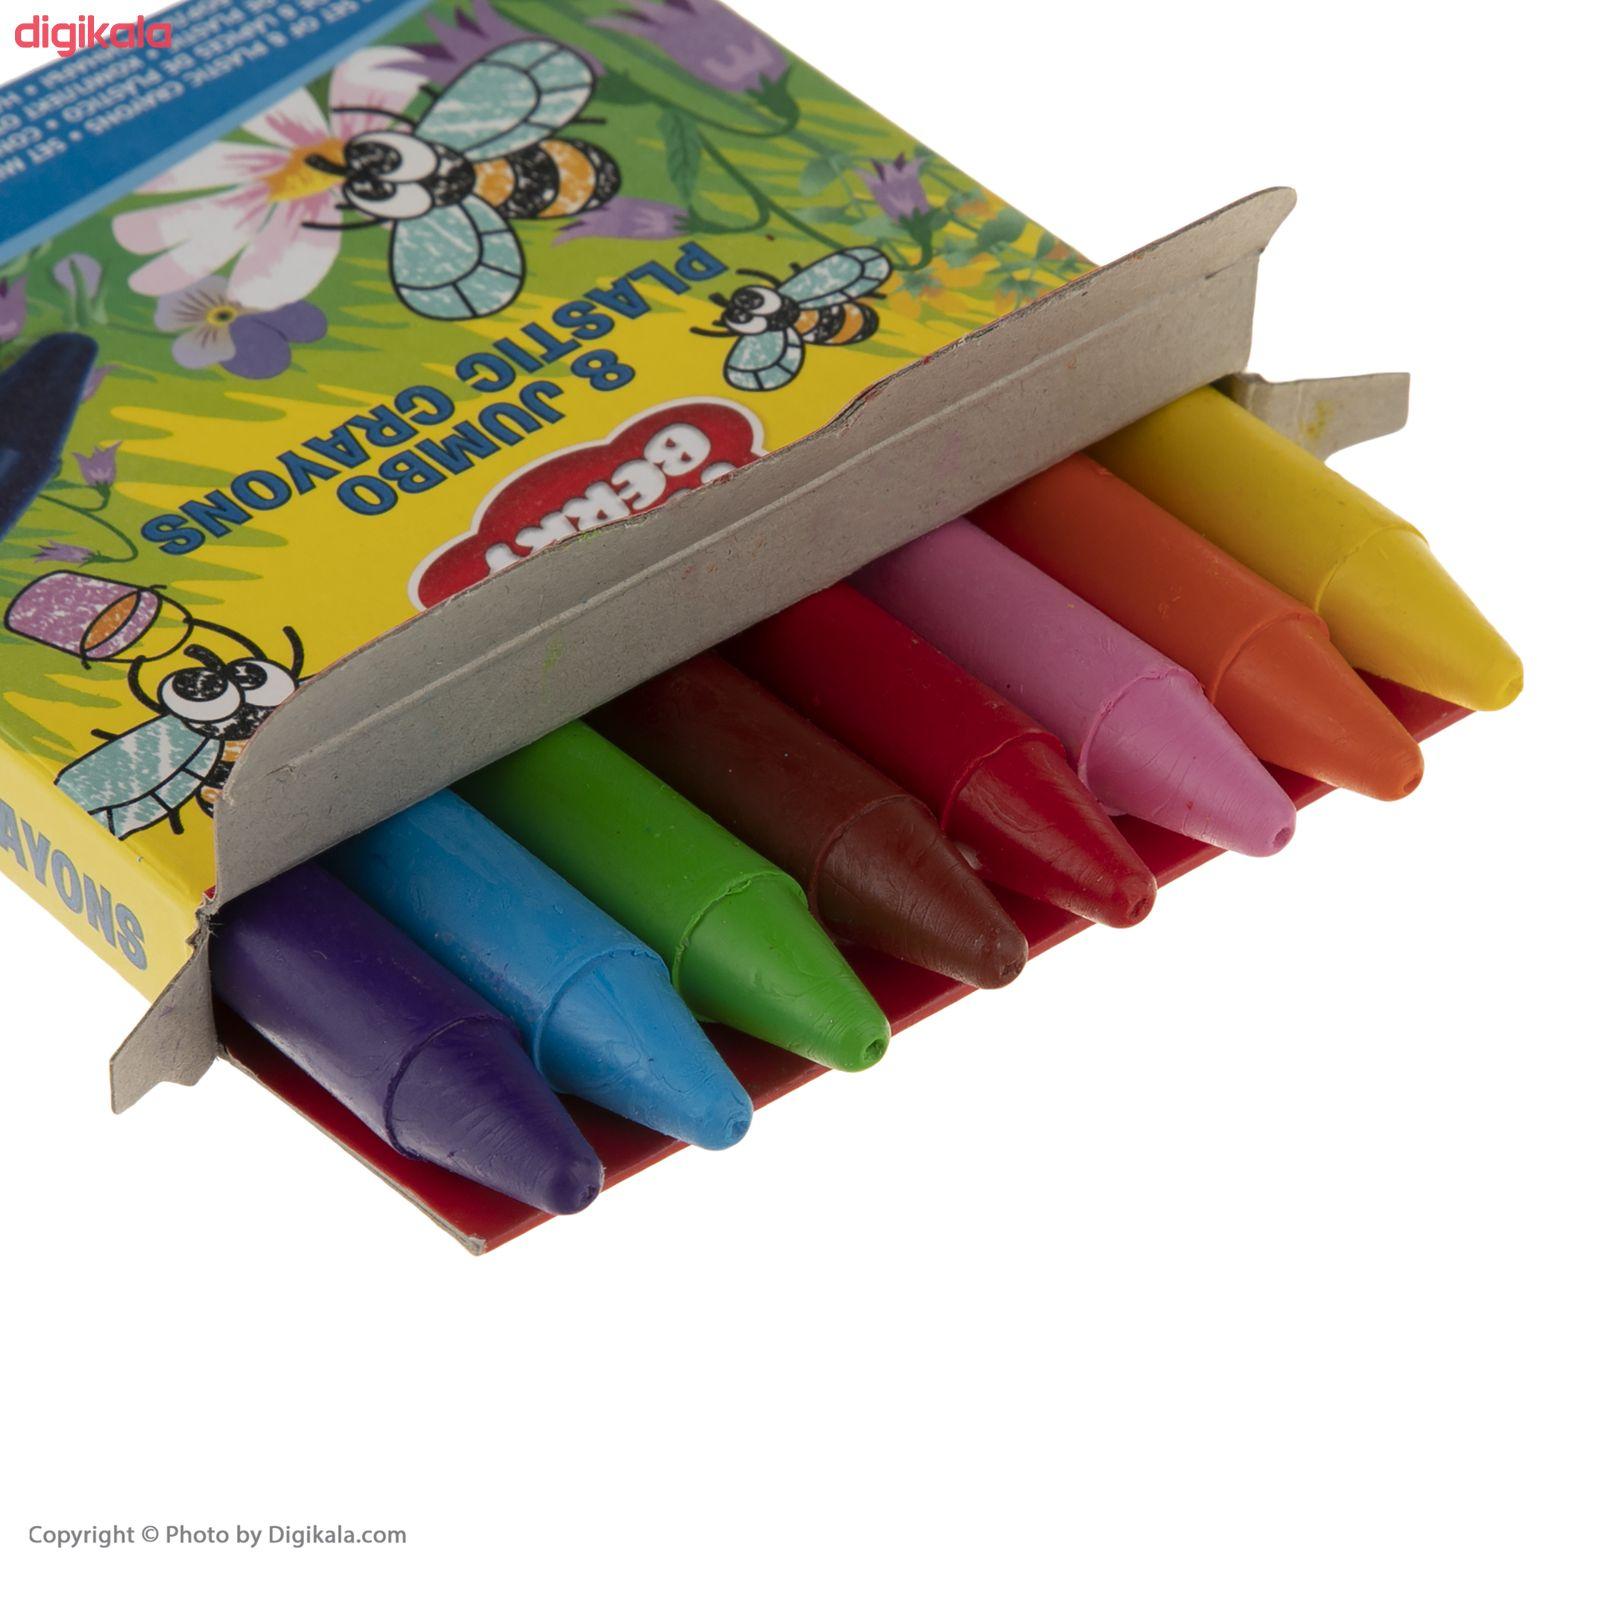 مداد شمعی 8 رنگ اریک کراوزه مدل EK33113 main 1 4